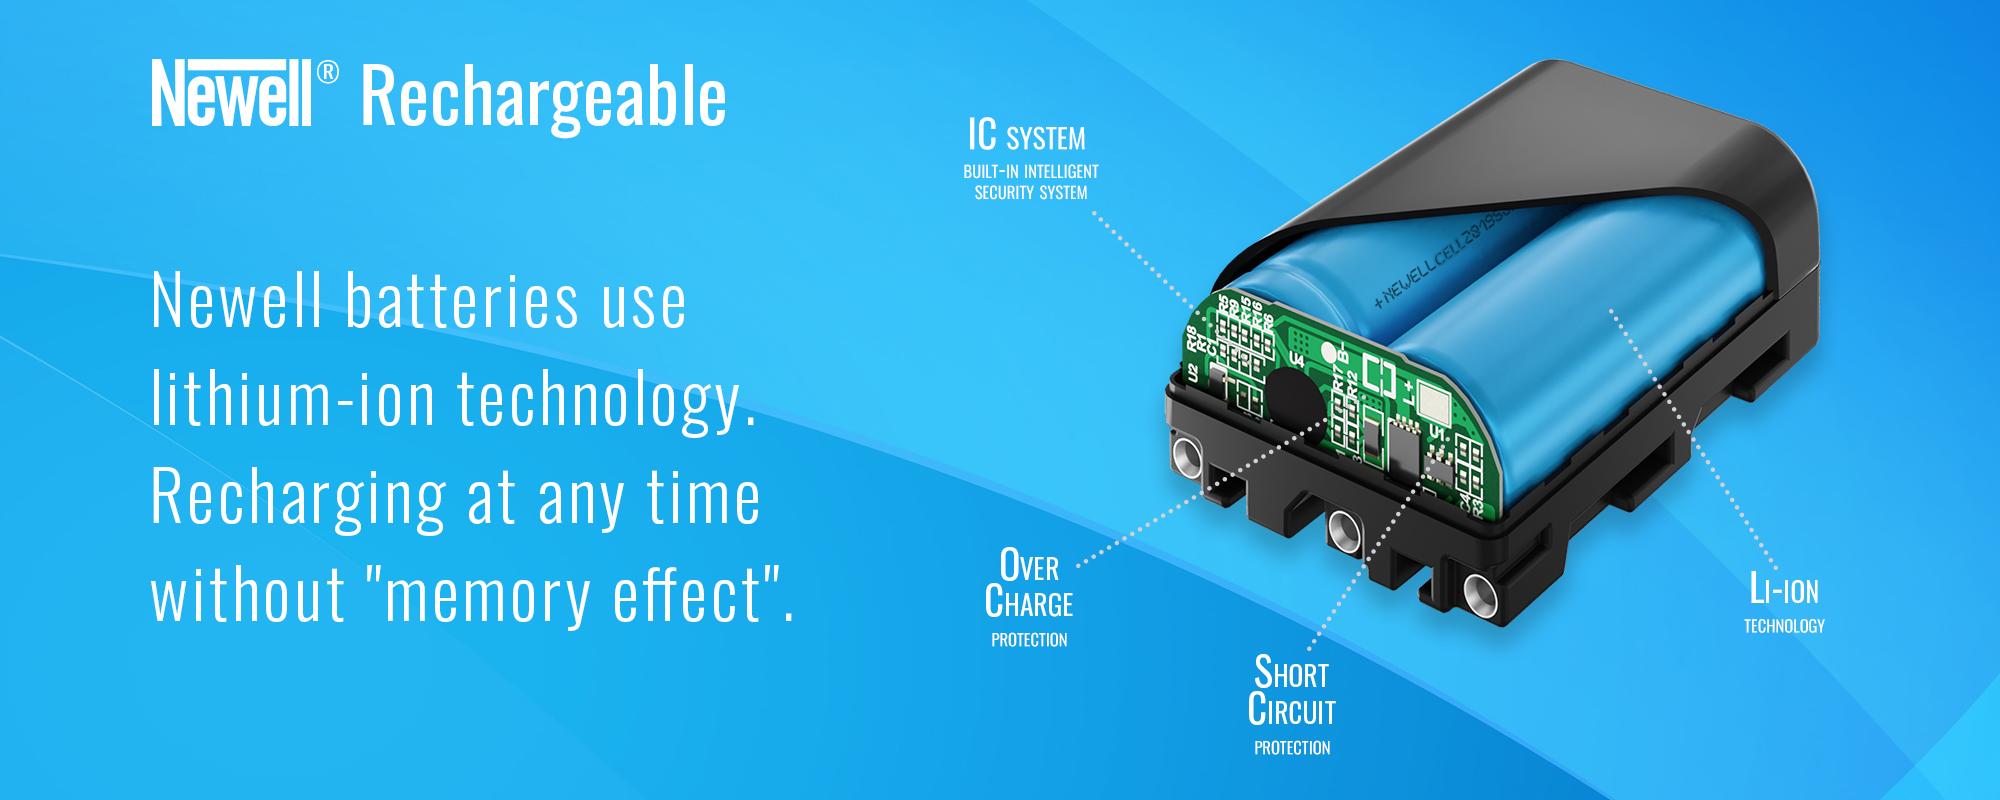 akumulator litowo jonowy na niebieskim tle newell rechargeable batteries